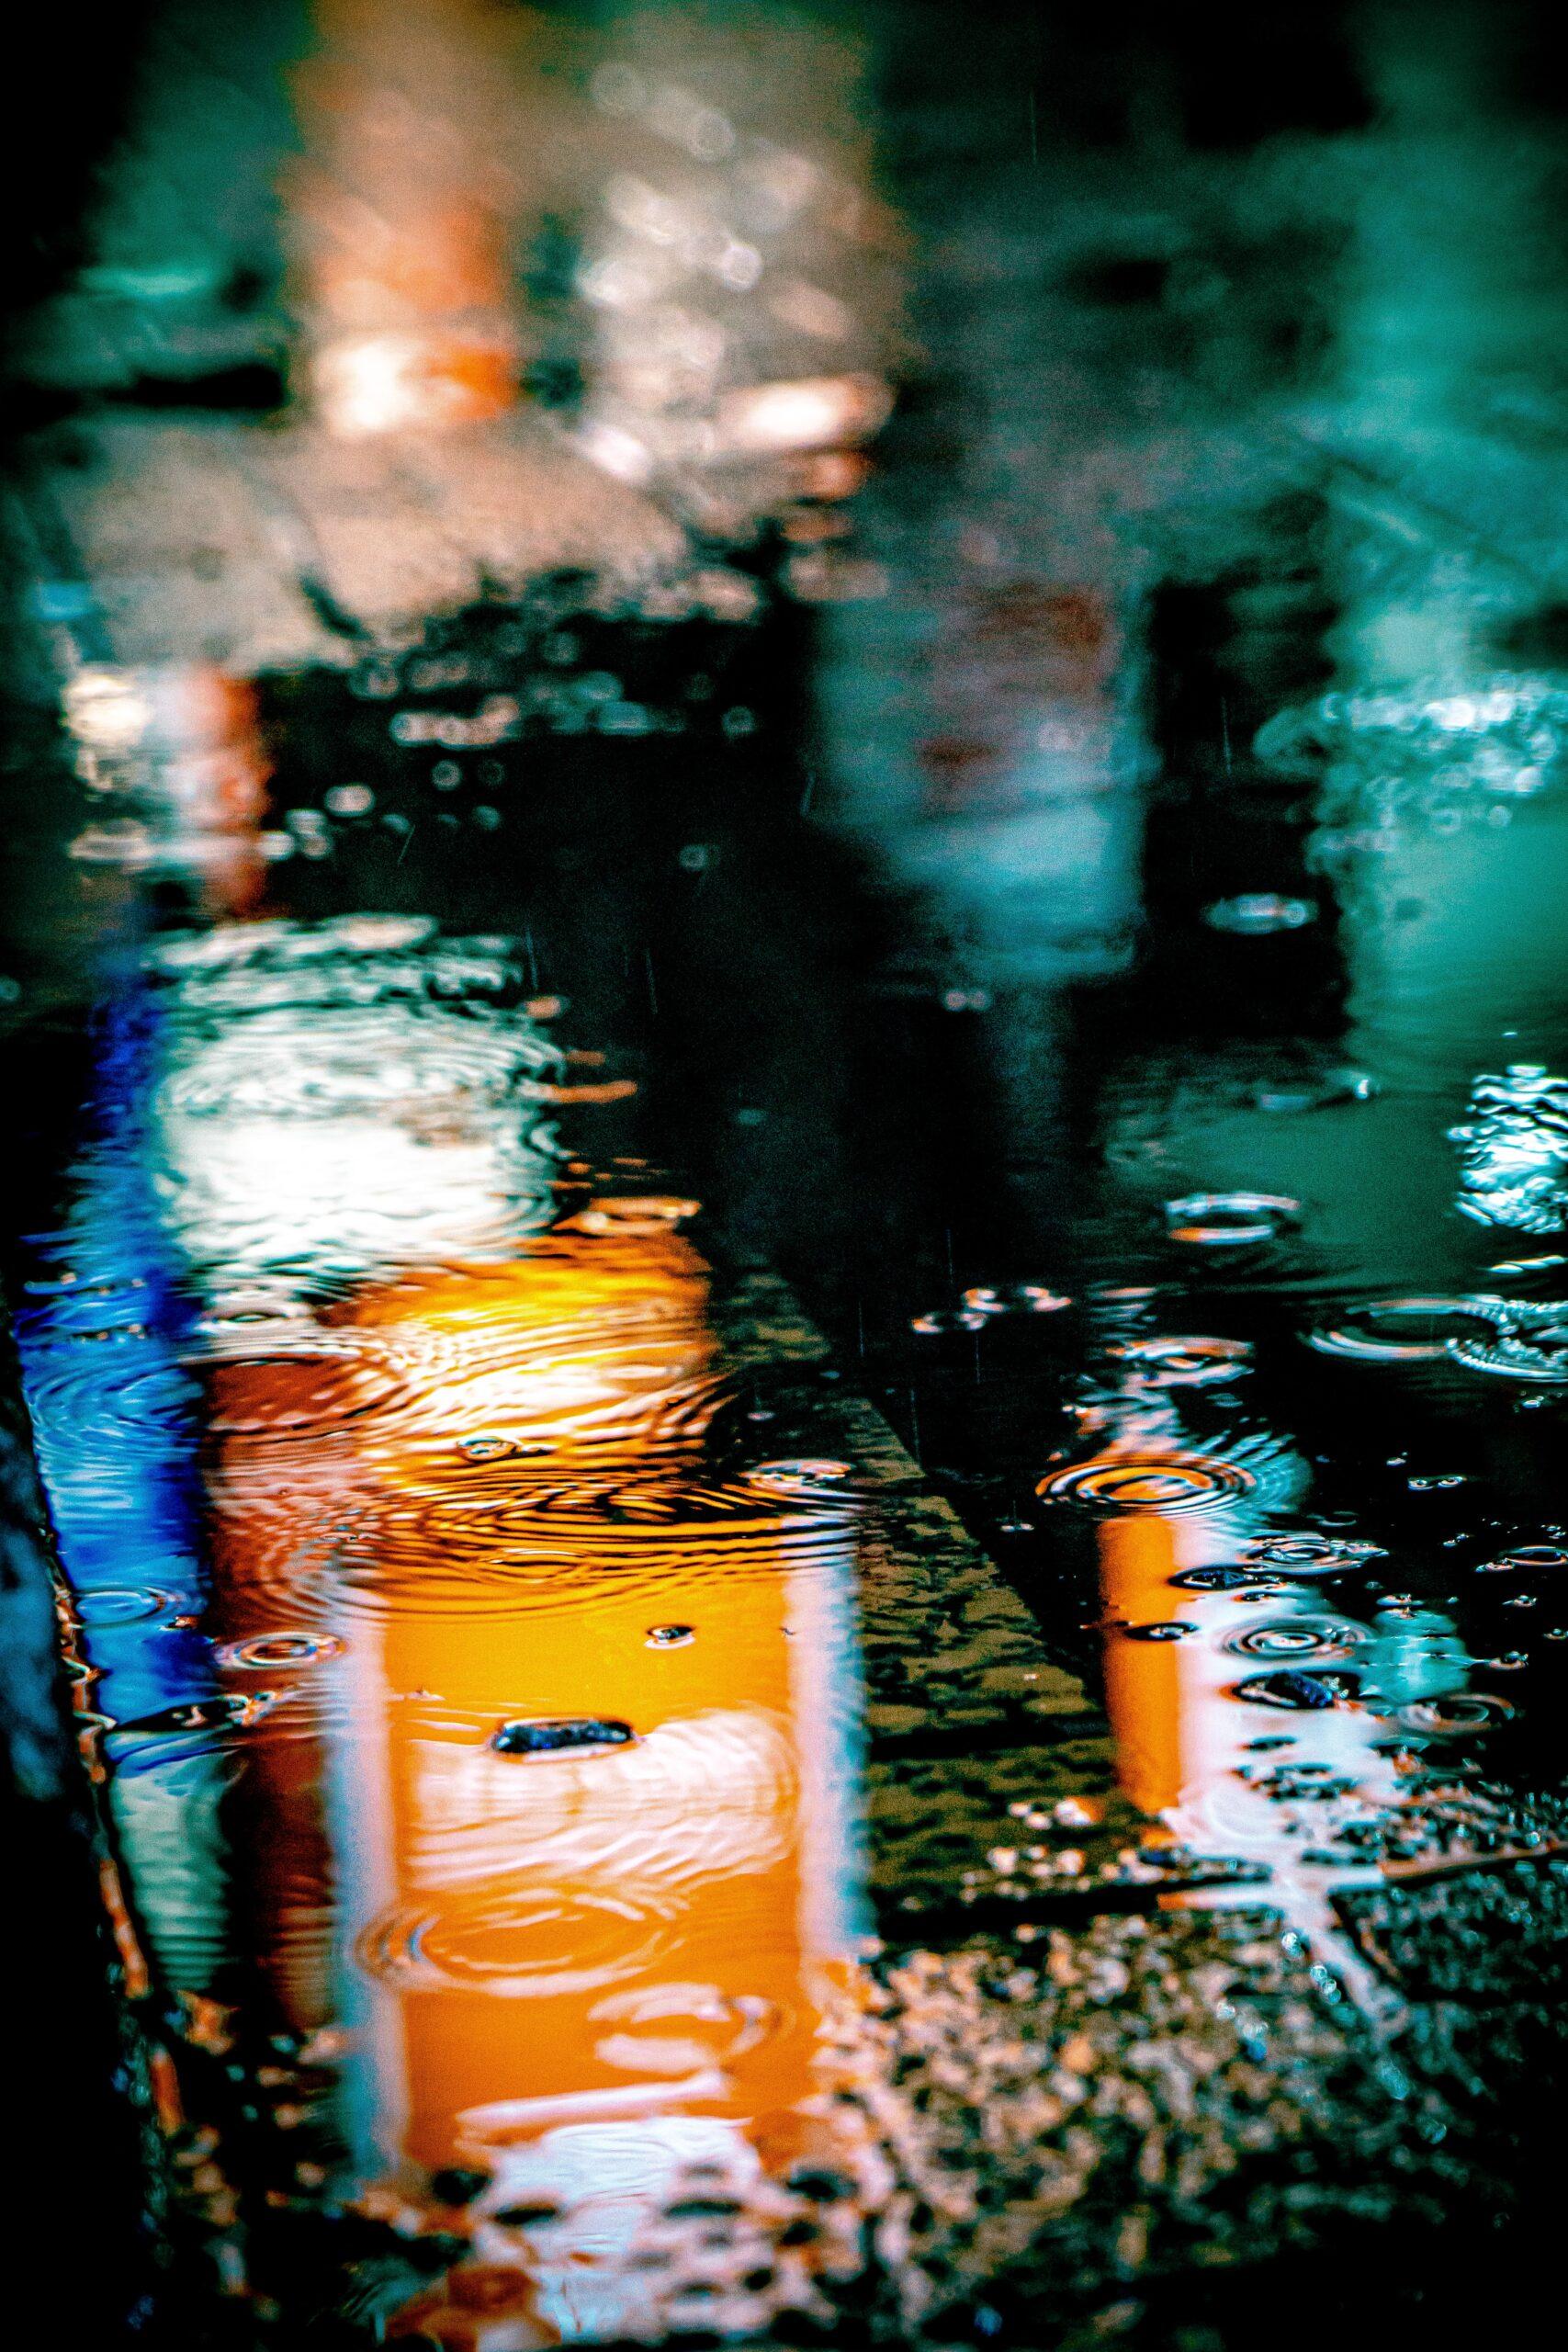 rainy, wet sidewalk